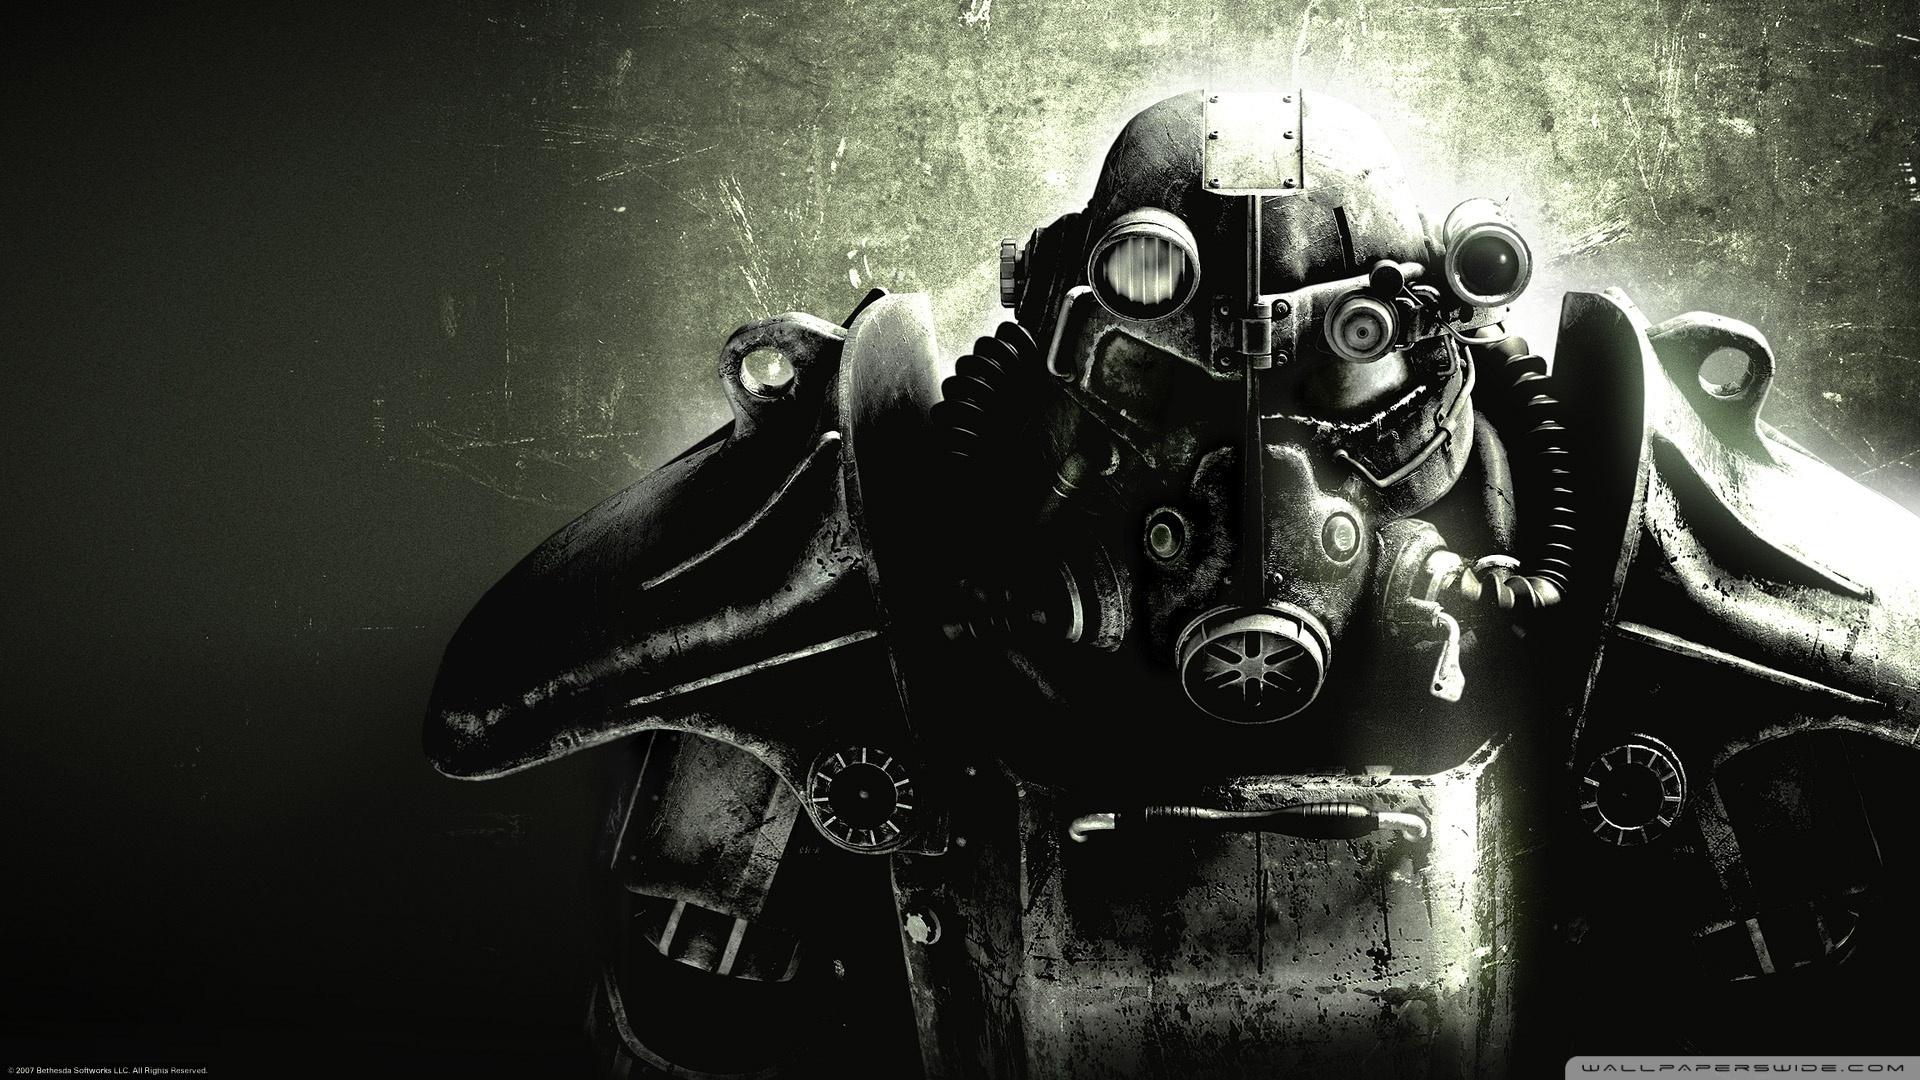 Falloutwallpaper on Fallout 3 Hd Wallpaper   General   809779